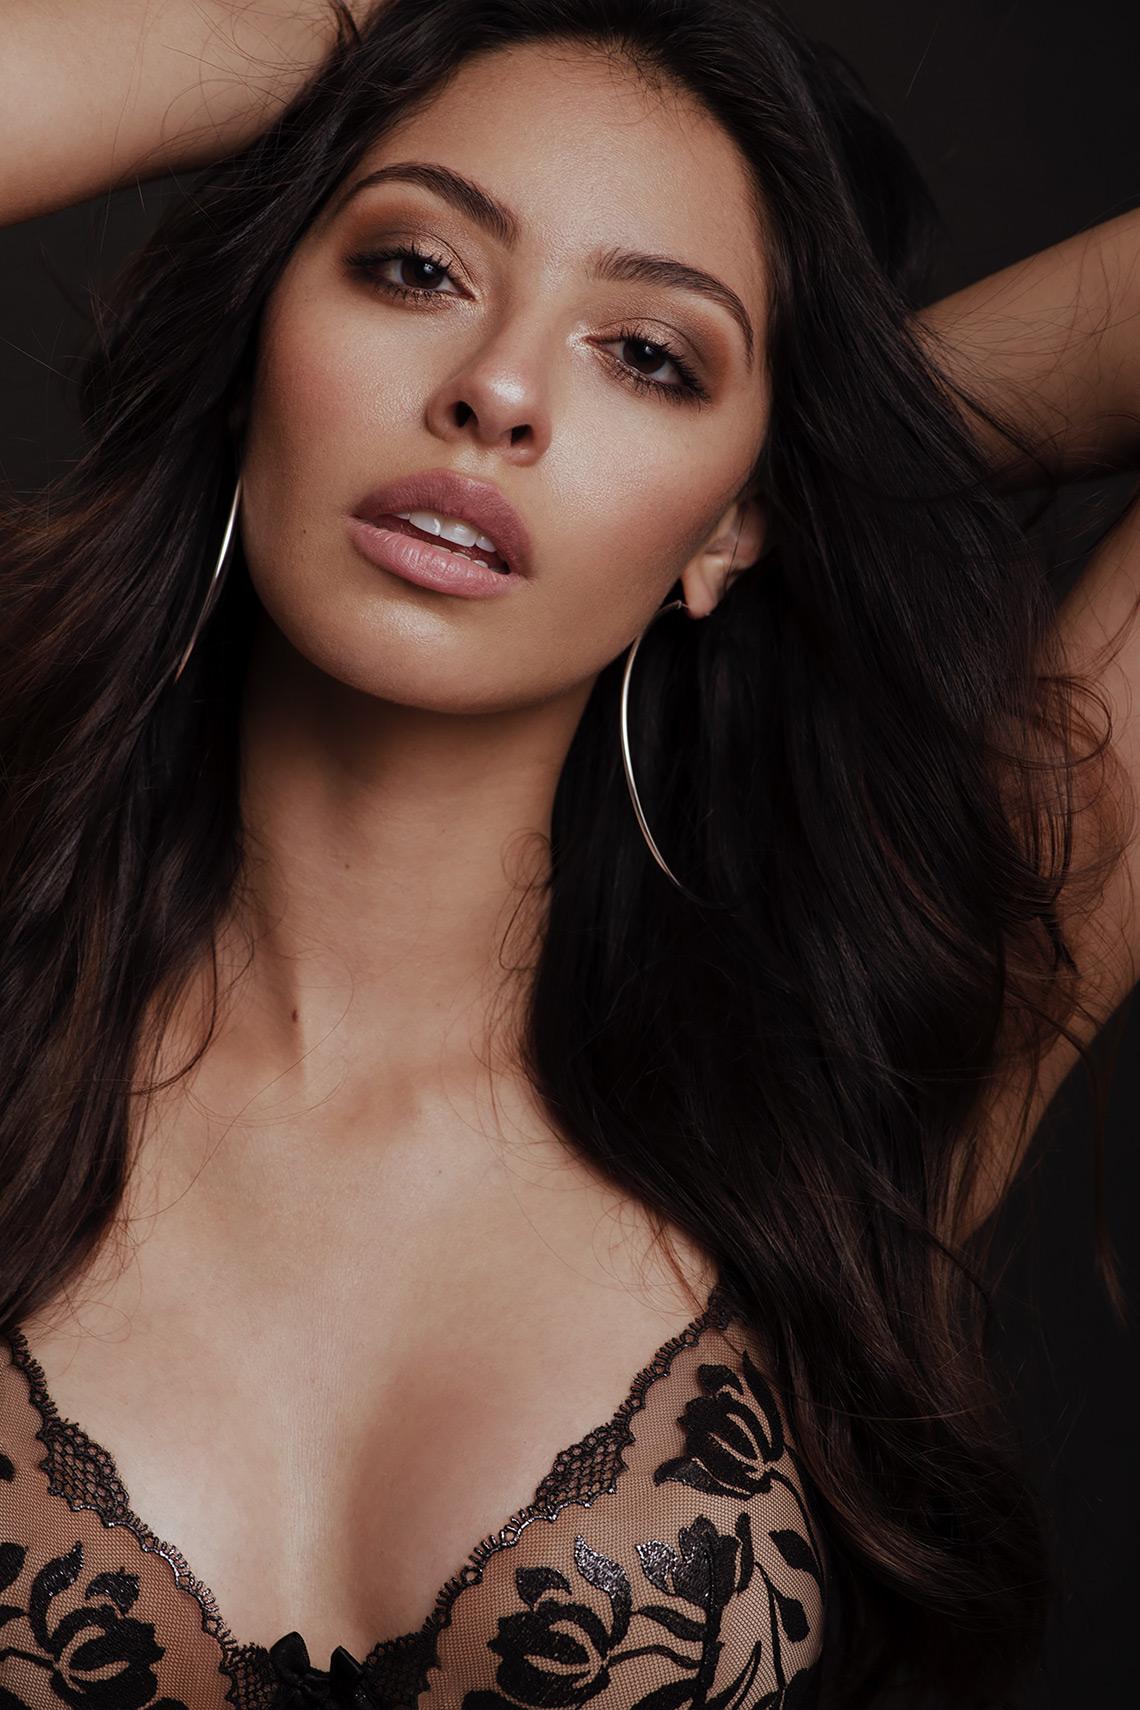 Fotografia de retrato Cali Alejandra Cuero 2